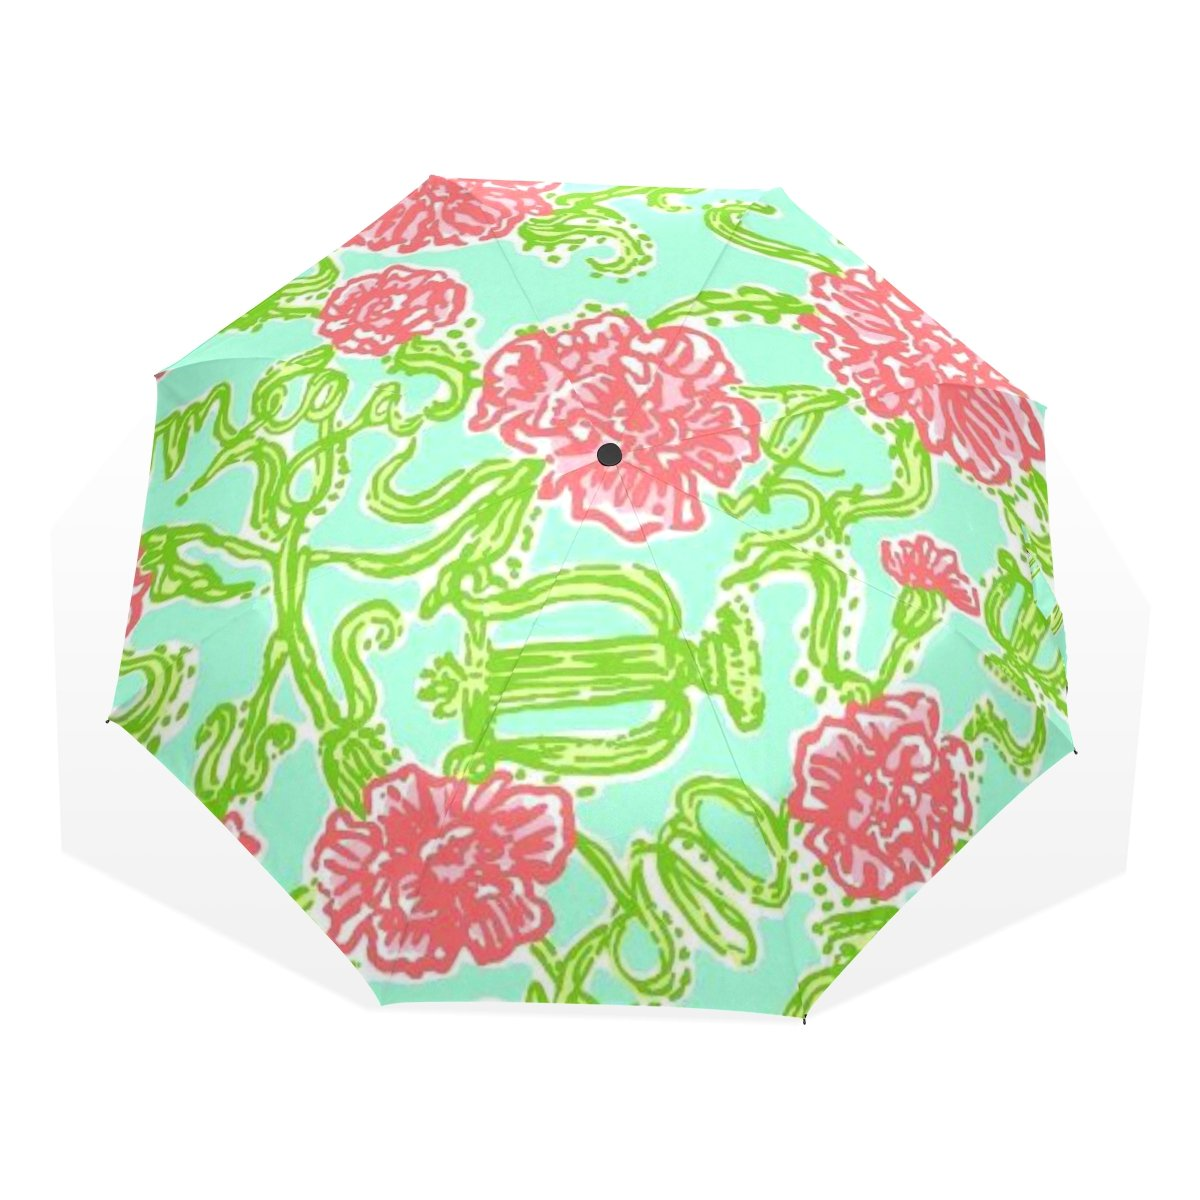 baihuishop防風ゴルフ傘、コンパクトで旅行for Easy Carryingスポーツ雨傘 – 強力なフレーム壊れない花葉パターン   B01K6VO3U0